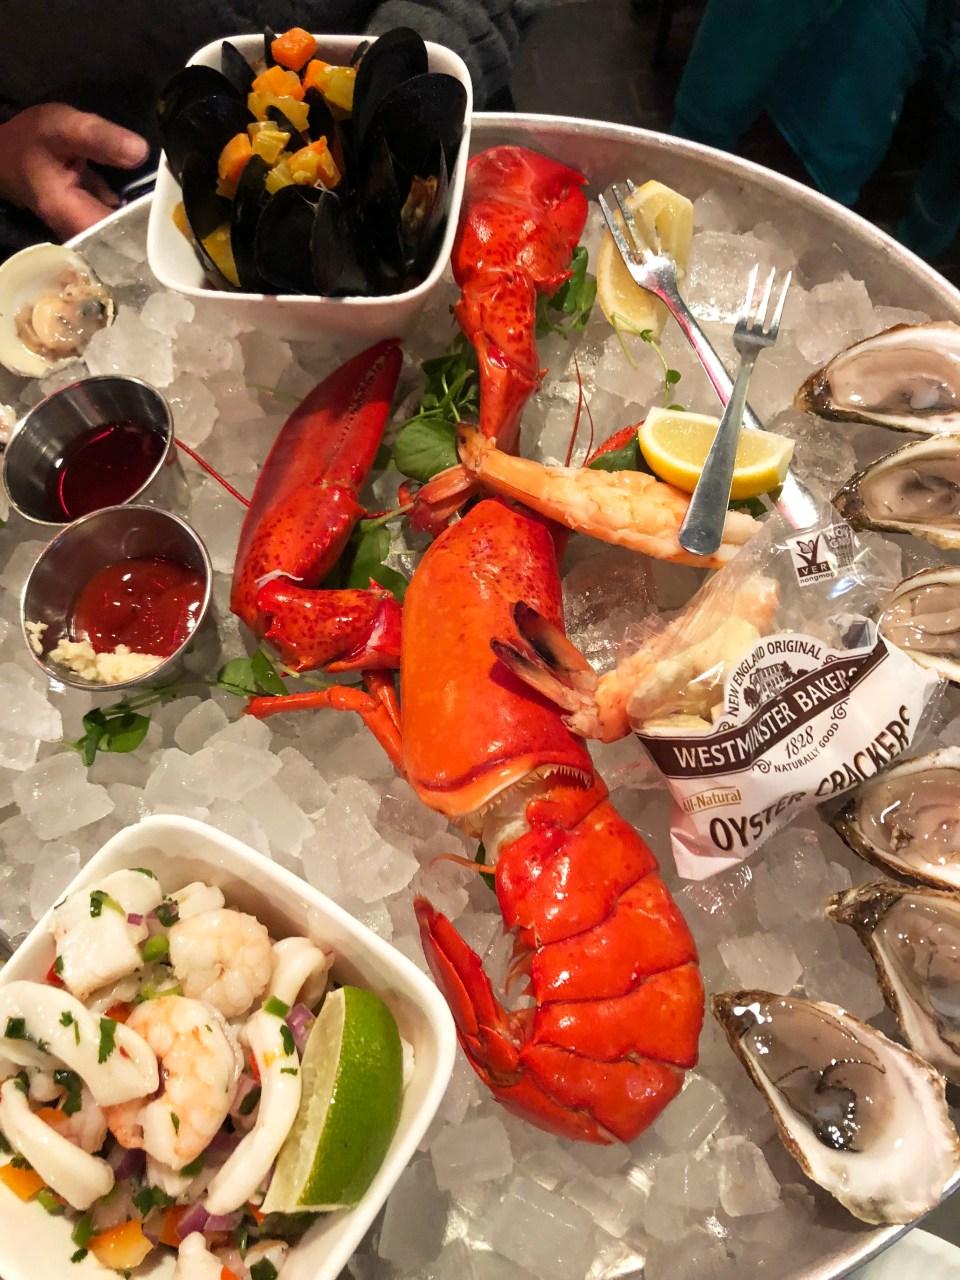 Hank's Oyster Bar - Seafood Plateau